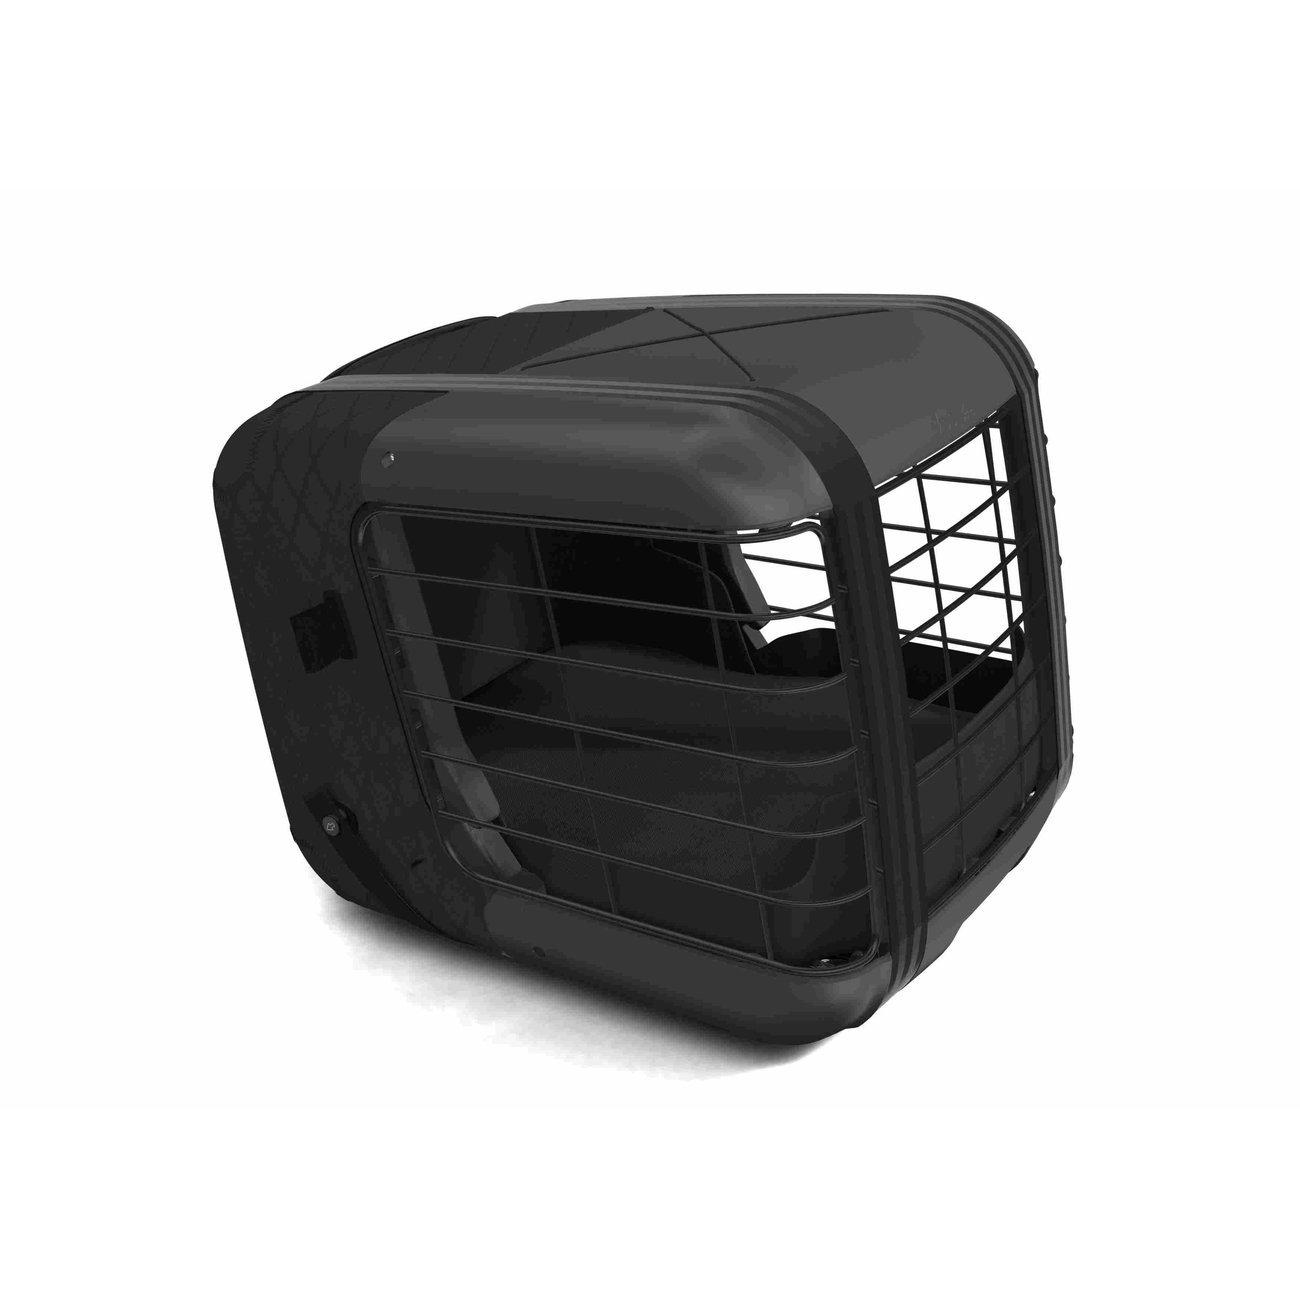 4pets Dog Caree Hundebox Transportbox für Hunde, Bild 11